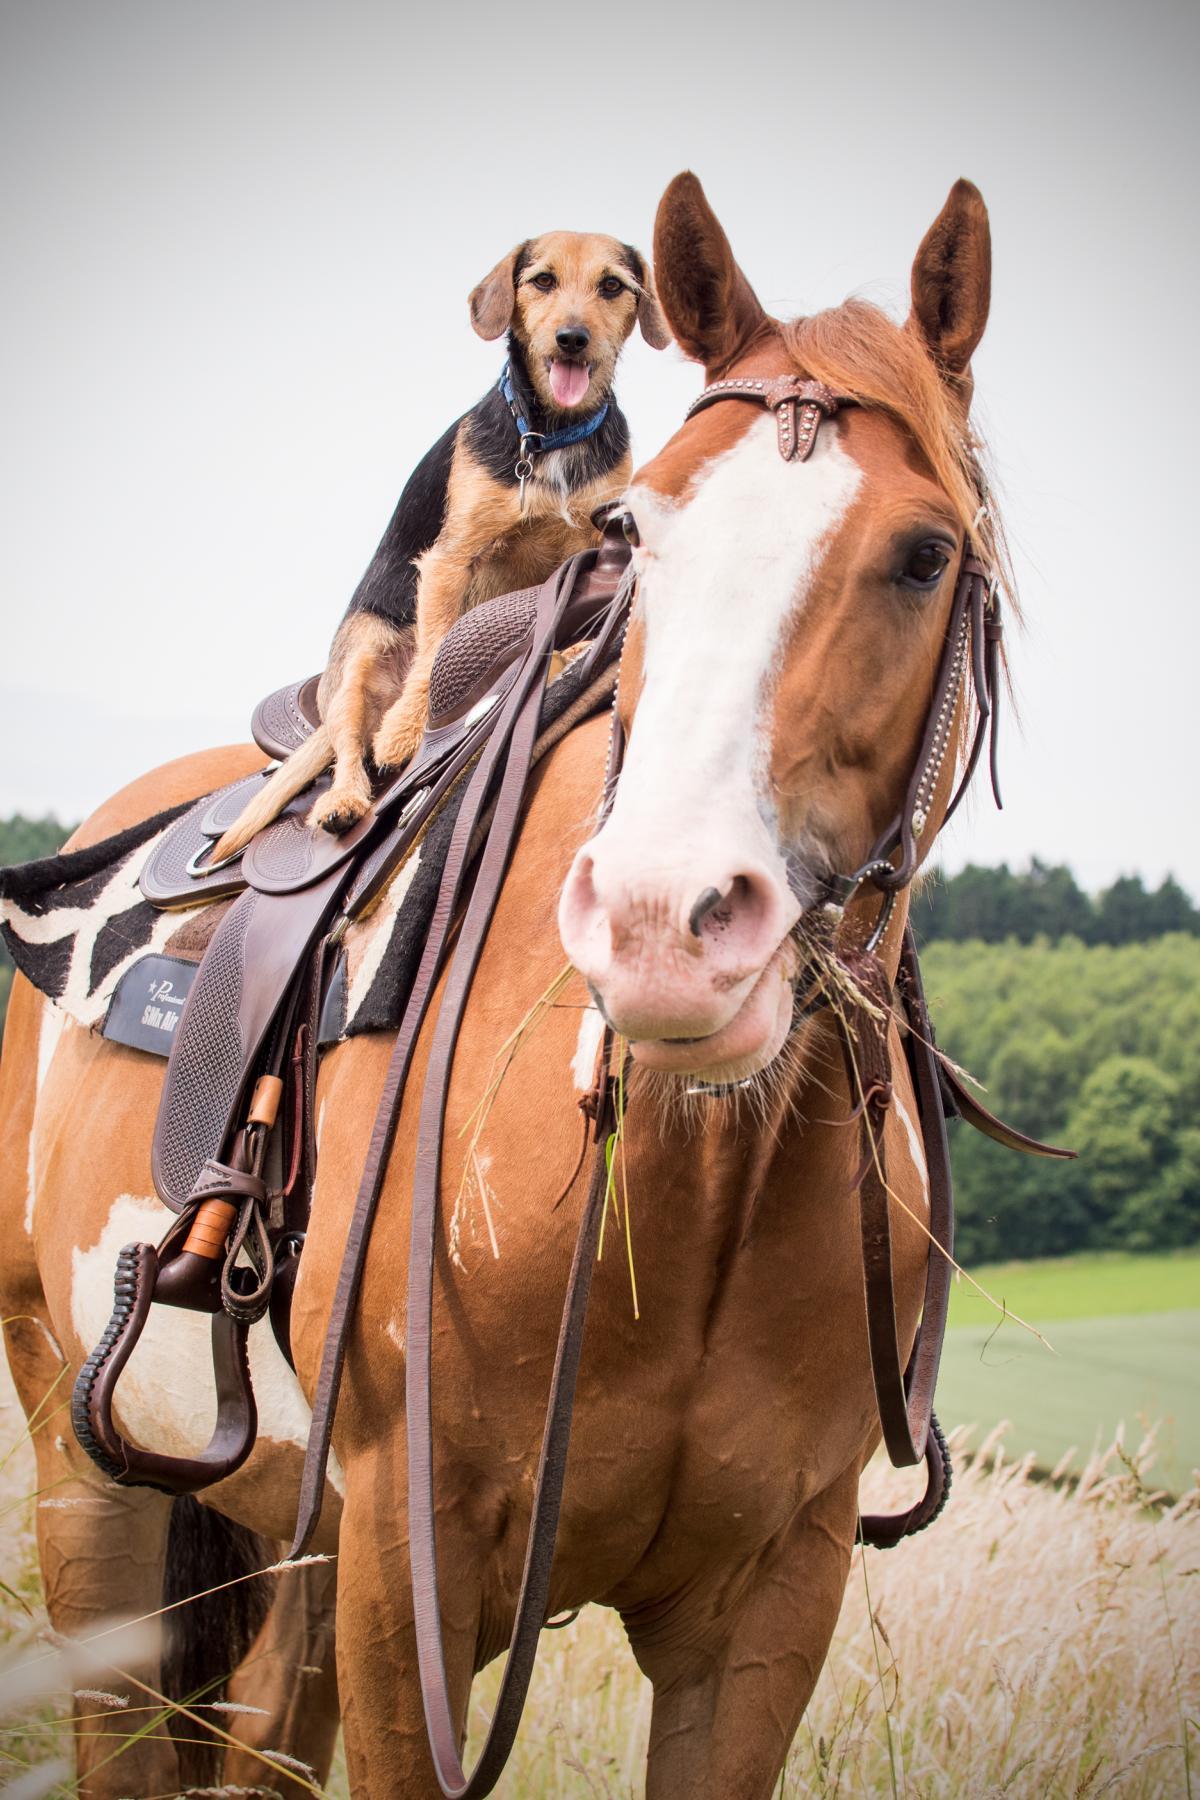 Dog Horse Quarter Horse Animalfriends